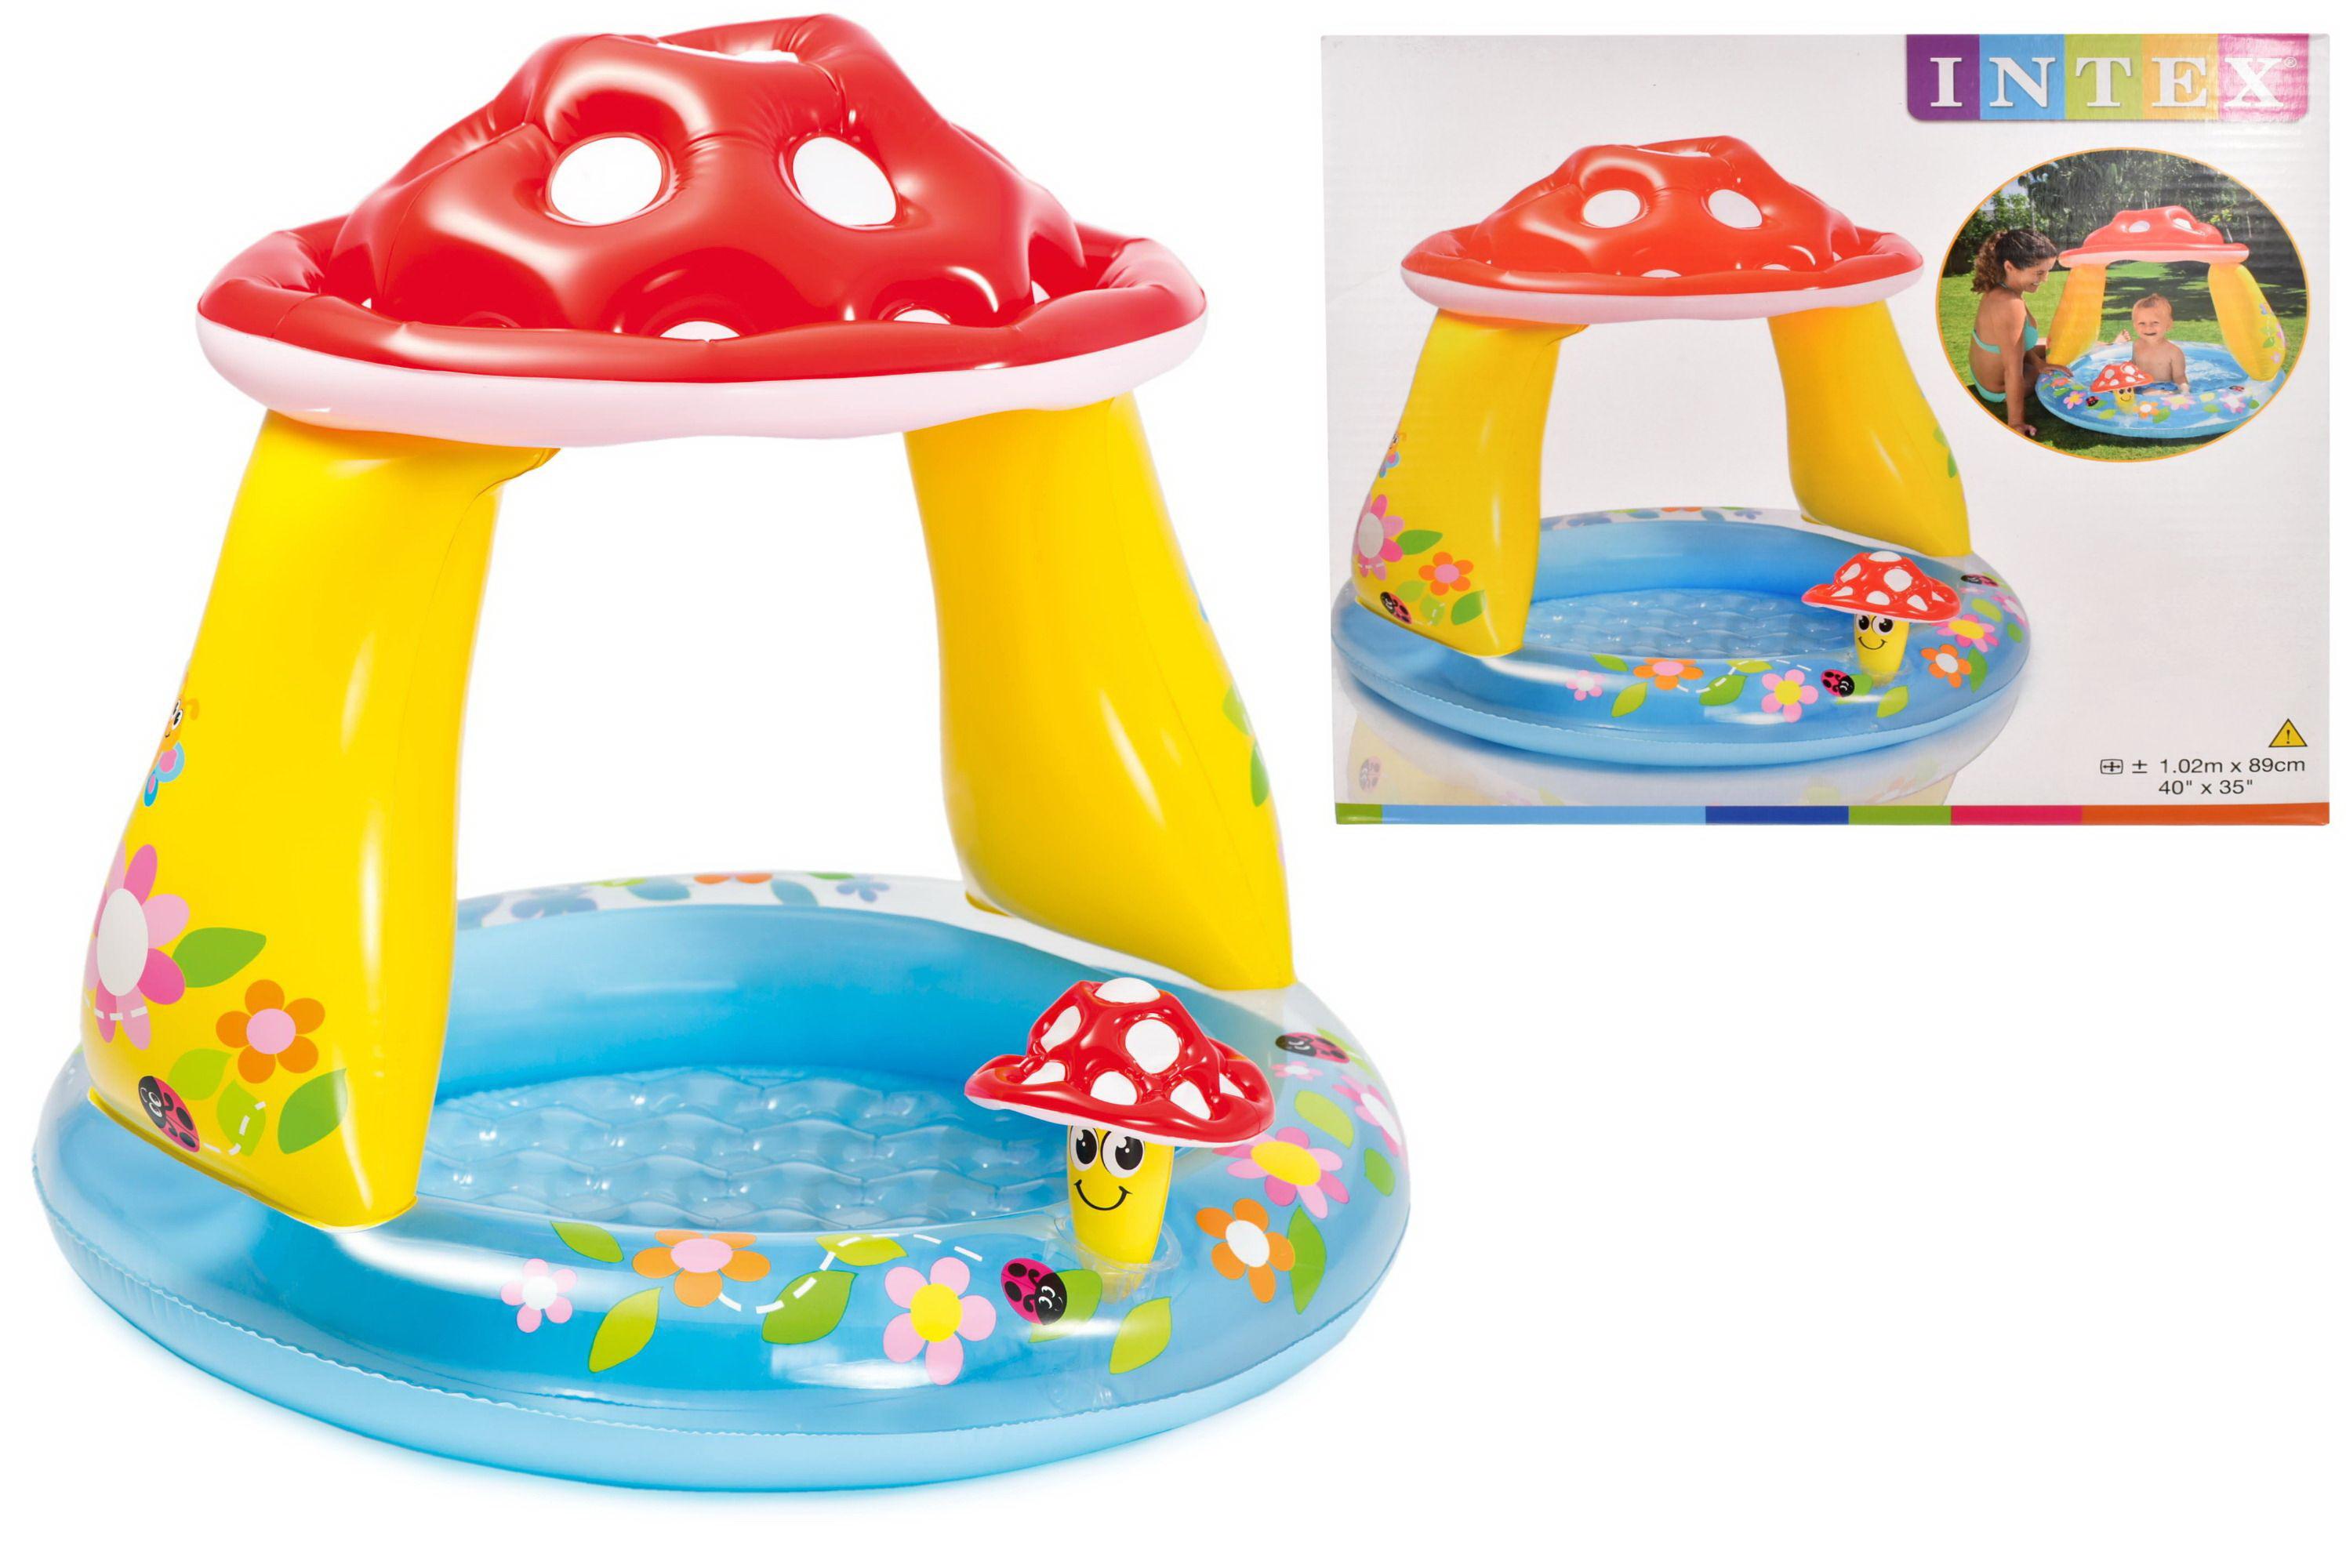 Intex Mushroom Baby Inflatable Pool Summer Sea Swim Water Beach Kids Fun